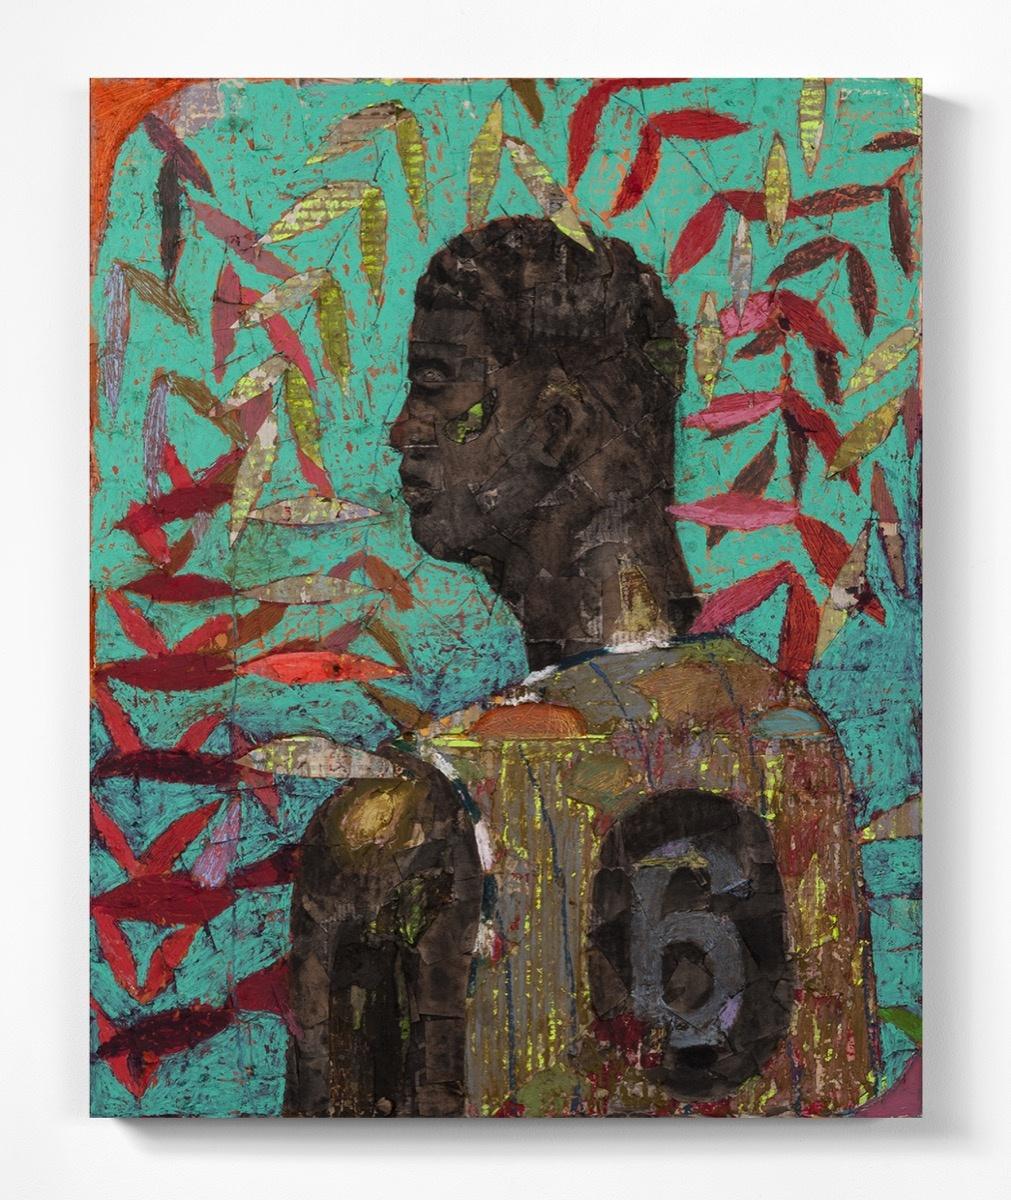 Derek Fordjour, No. 73, 2017. Courtesy the artist and Luce Gallery. Courtesy of Dallas Art Fair.